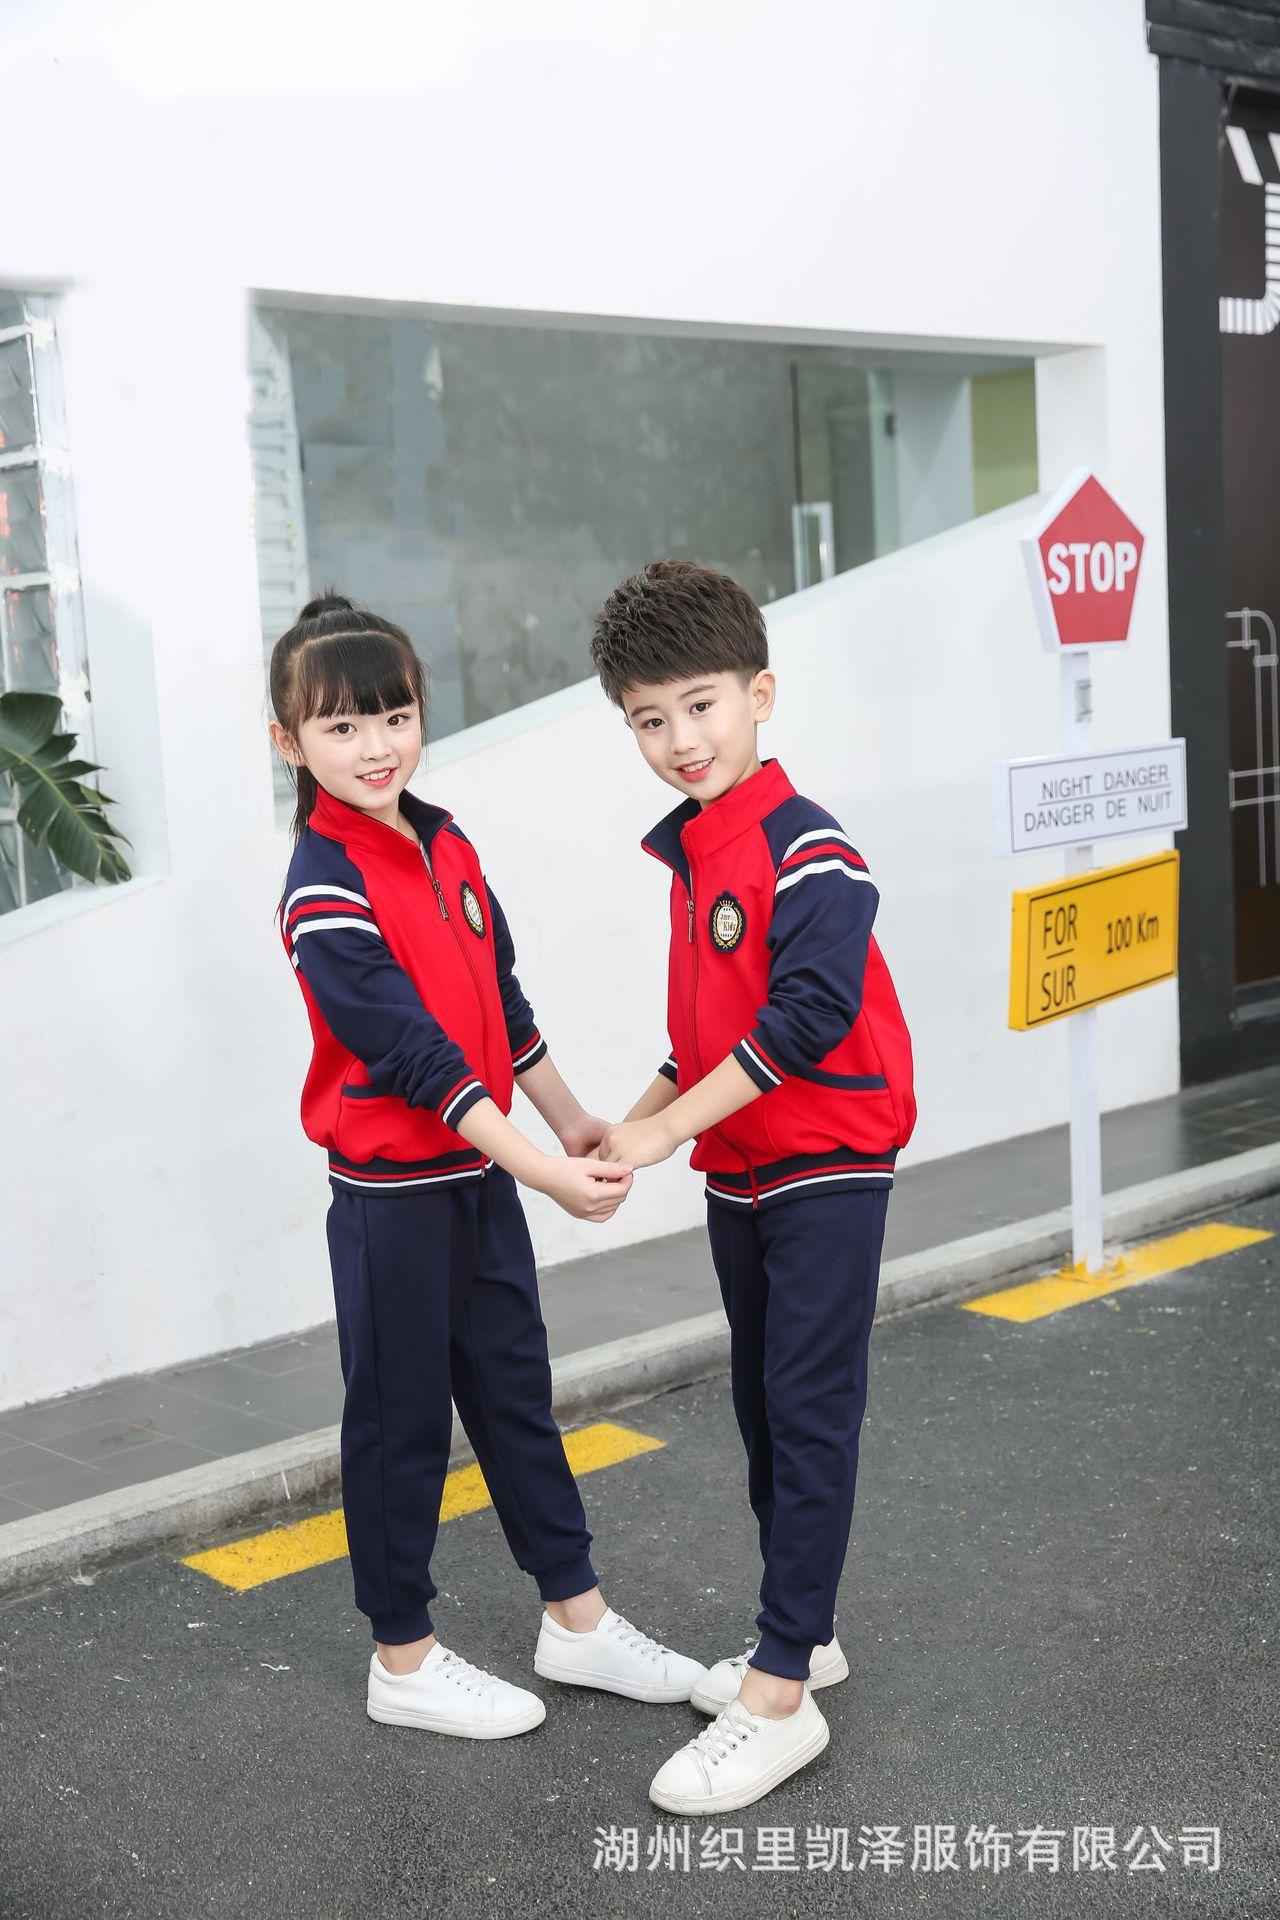 Young STUDENT'S School Uniform Set Spring And Autumn Children Business Attire British Style Sports Clothing Teacher Kindergarten